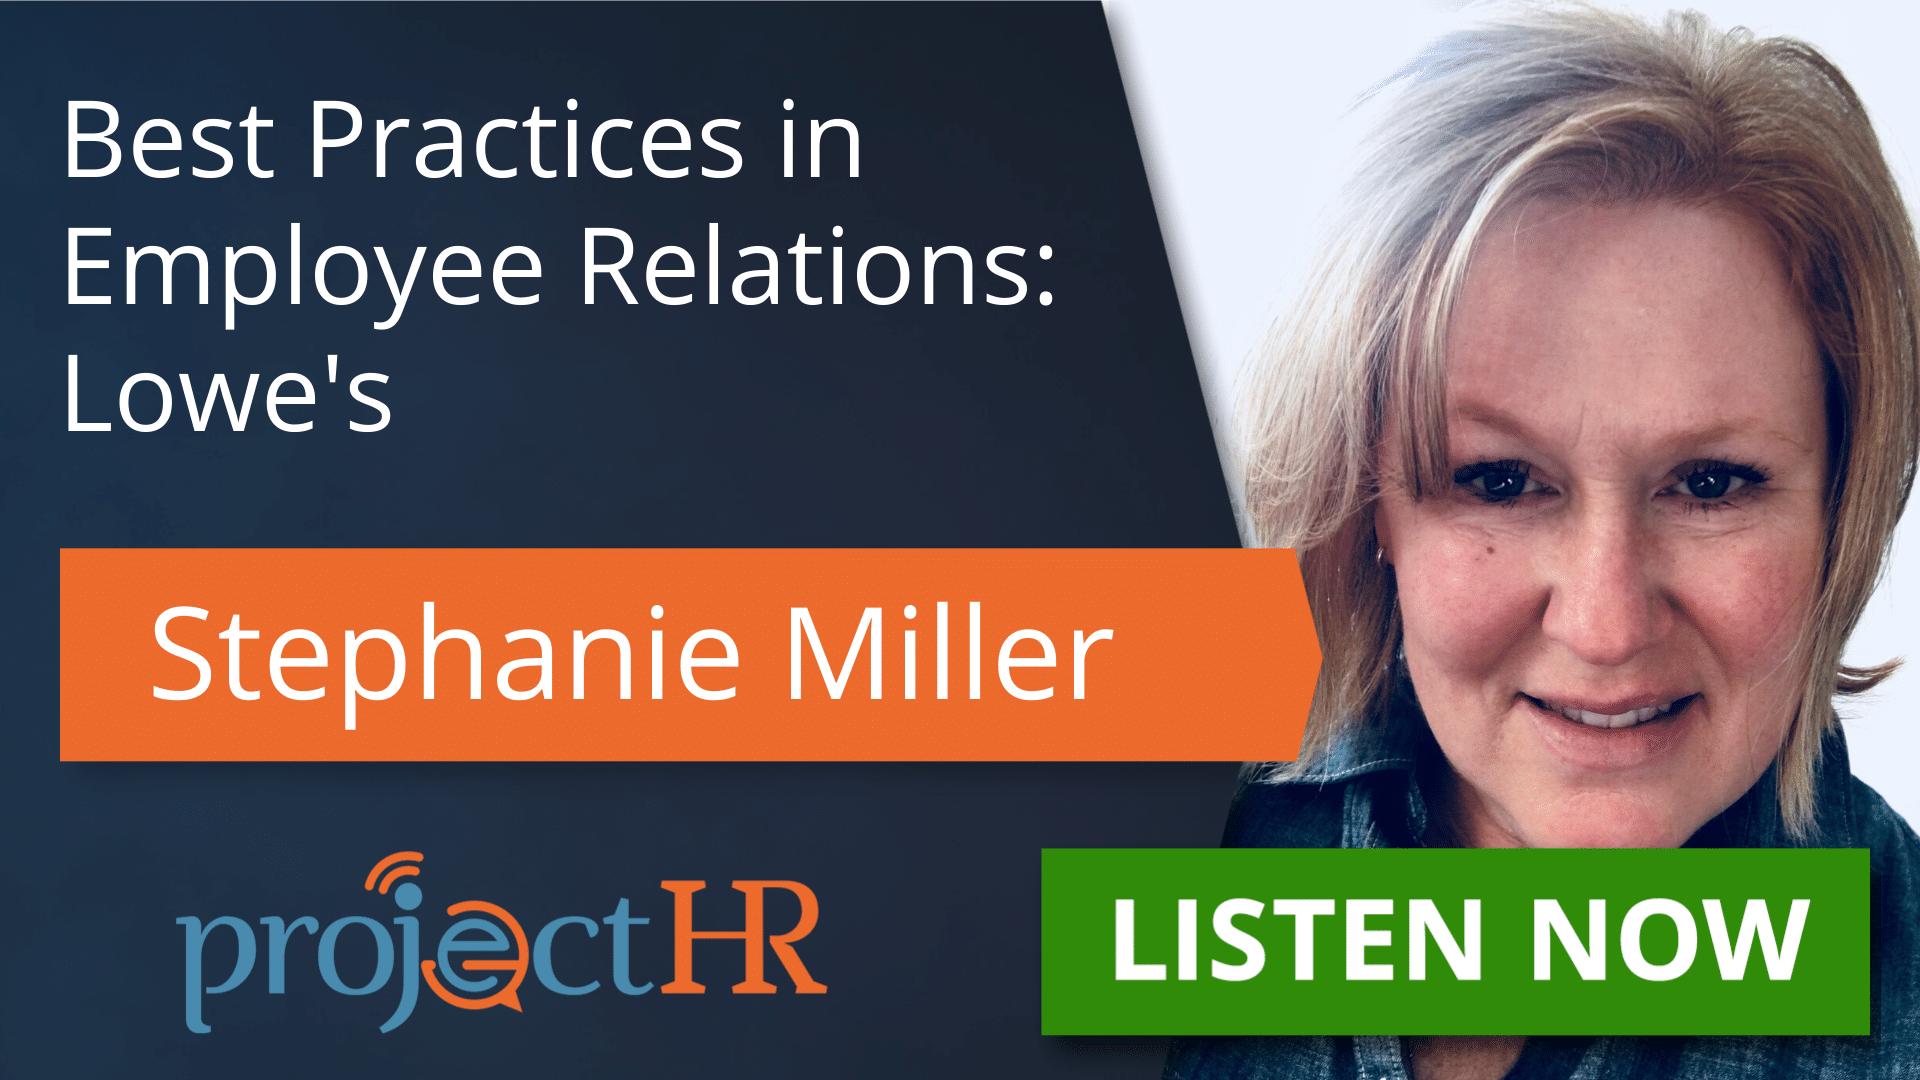 ways to improve employee relations